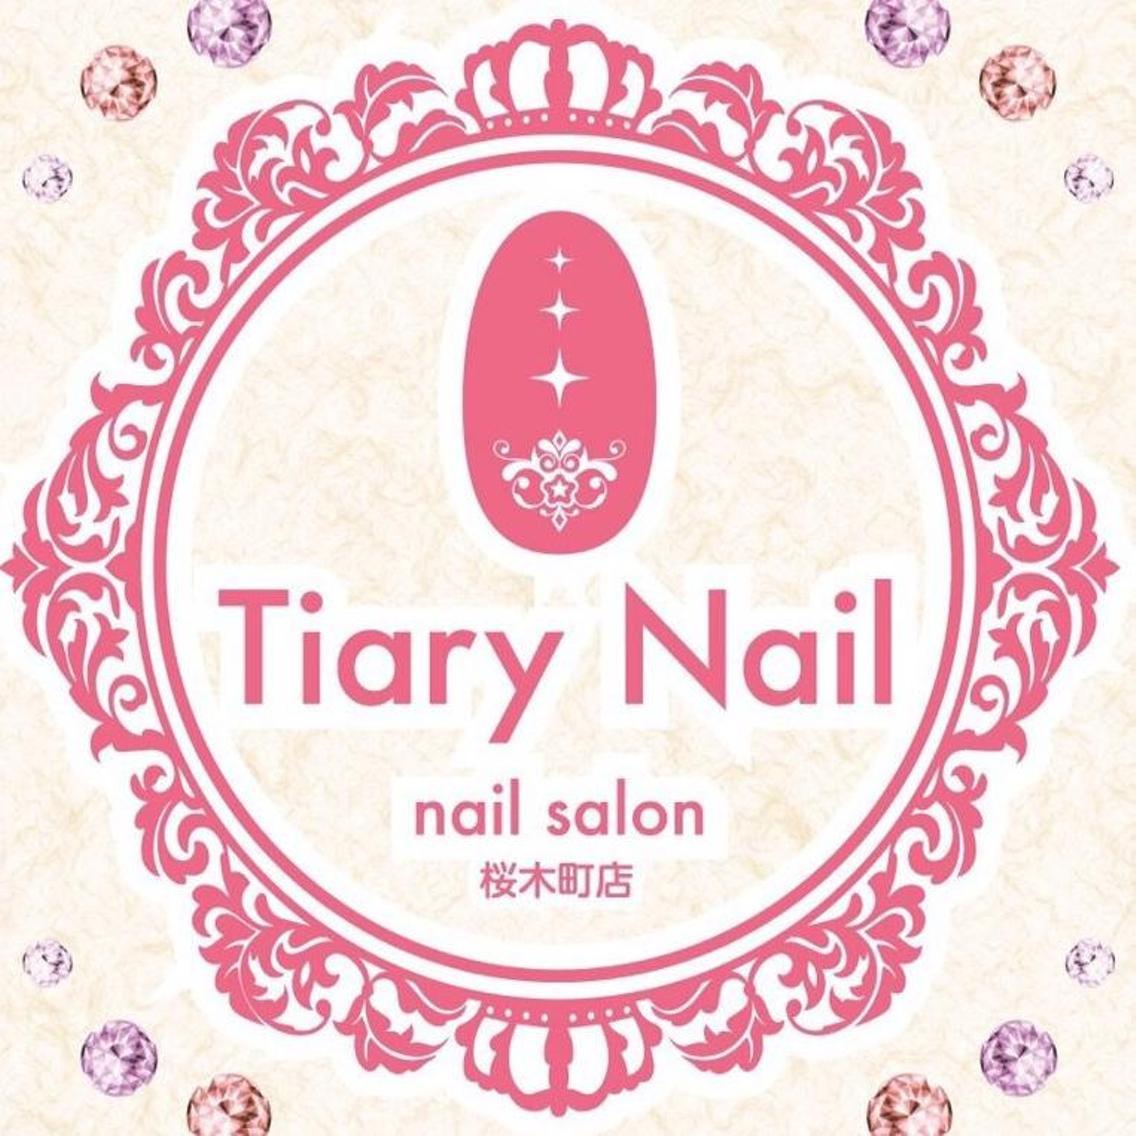 Tiary Nail桜木町店所属・Tiary Nail店長 沼田の掲載